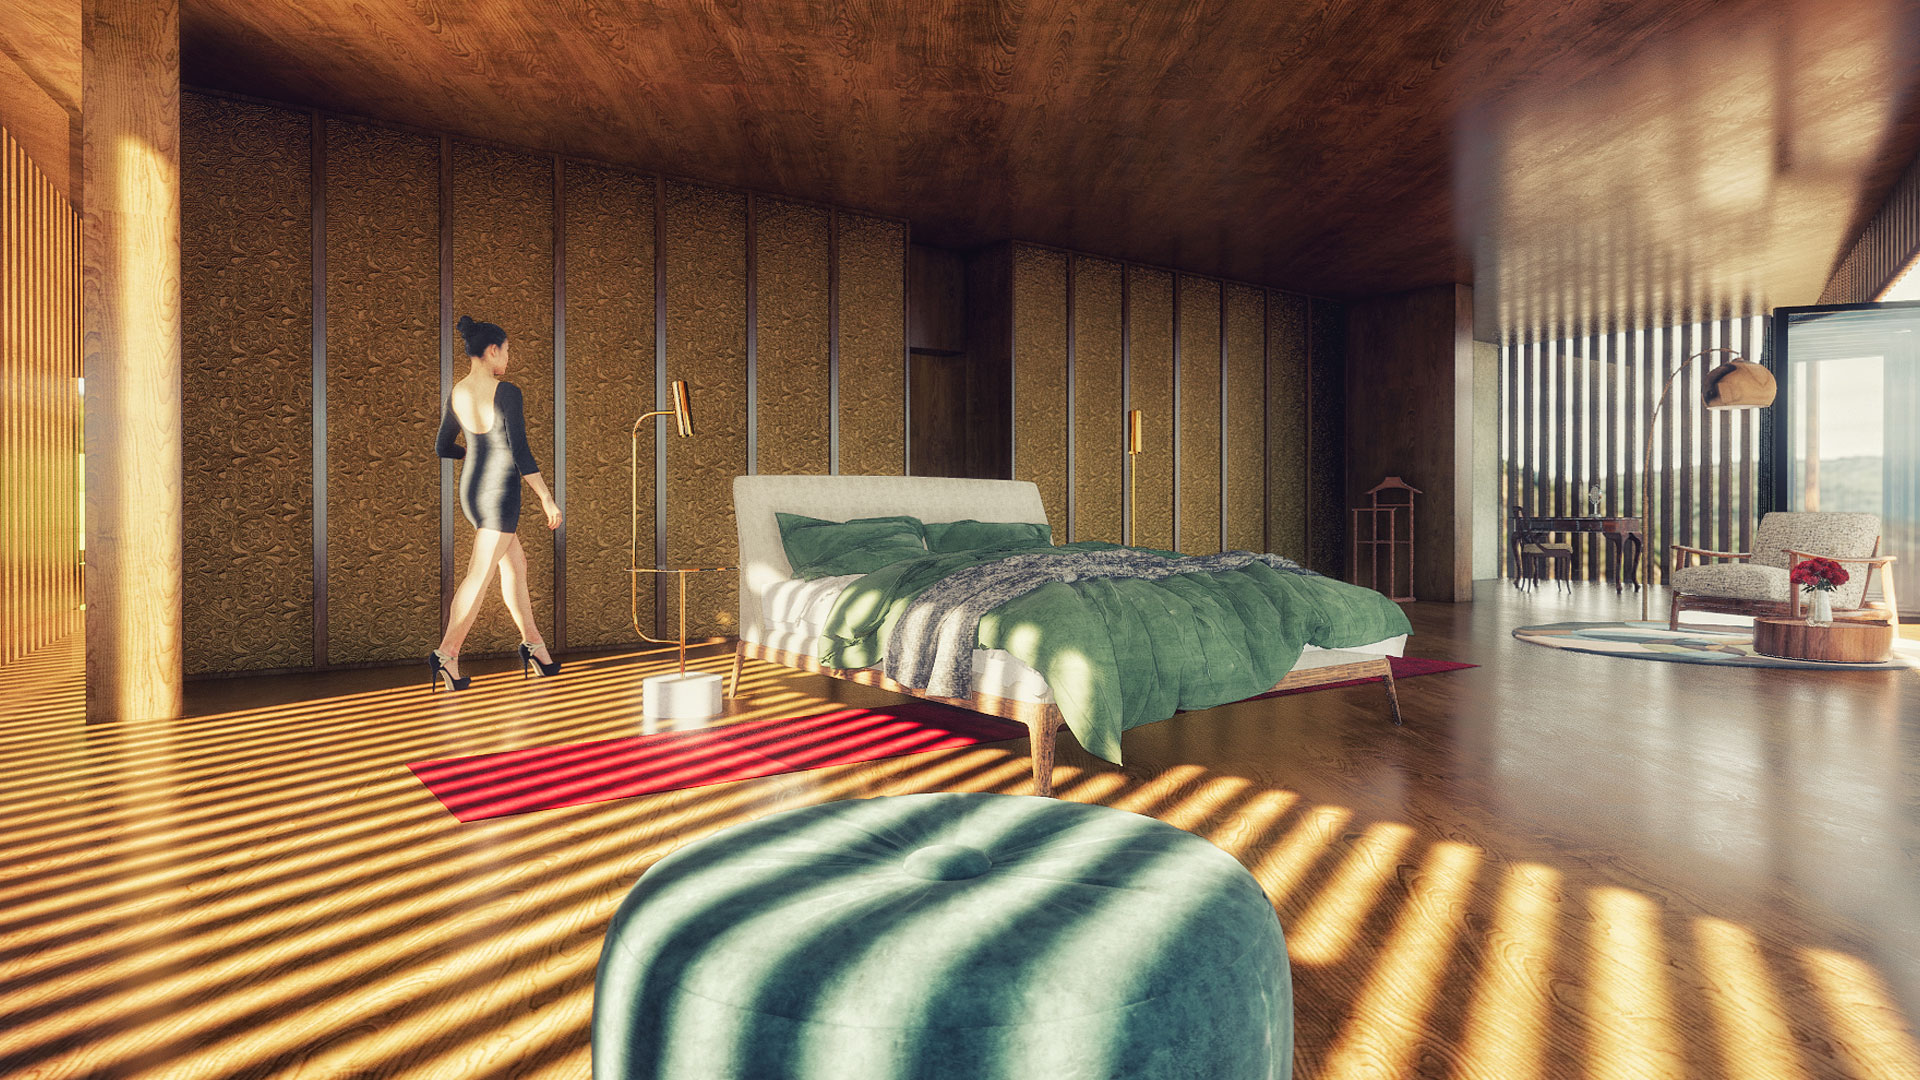 15_MASTER-BEDROOM-ROOM-MARBY-DRIVE-MALIBU-EVOLVERE-ABITANDO.jpg